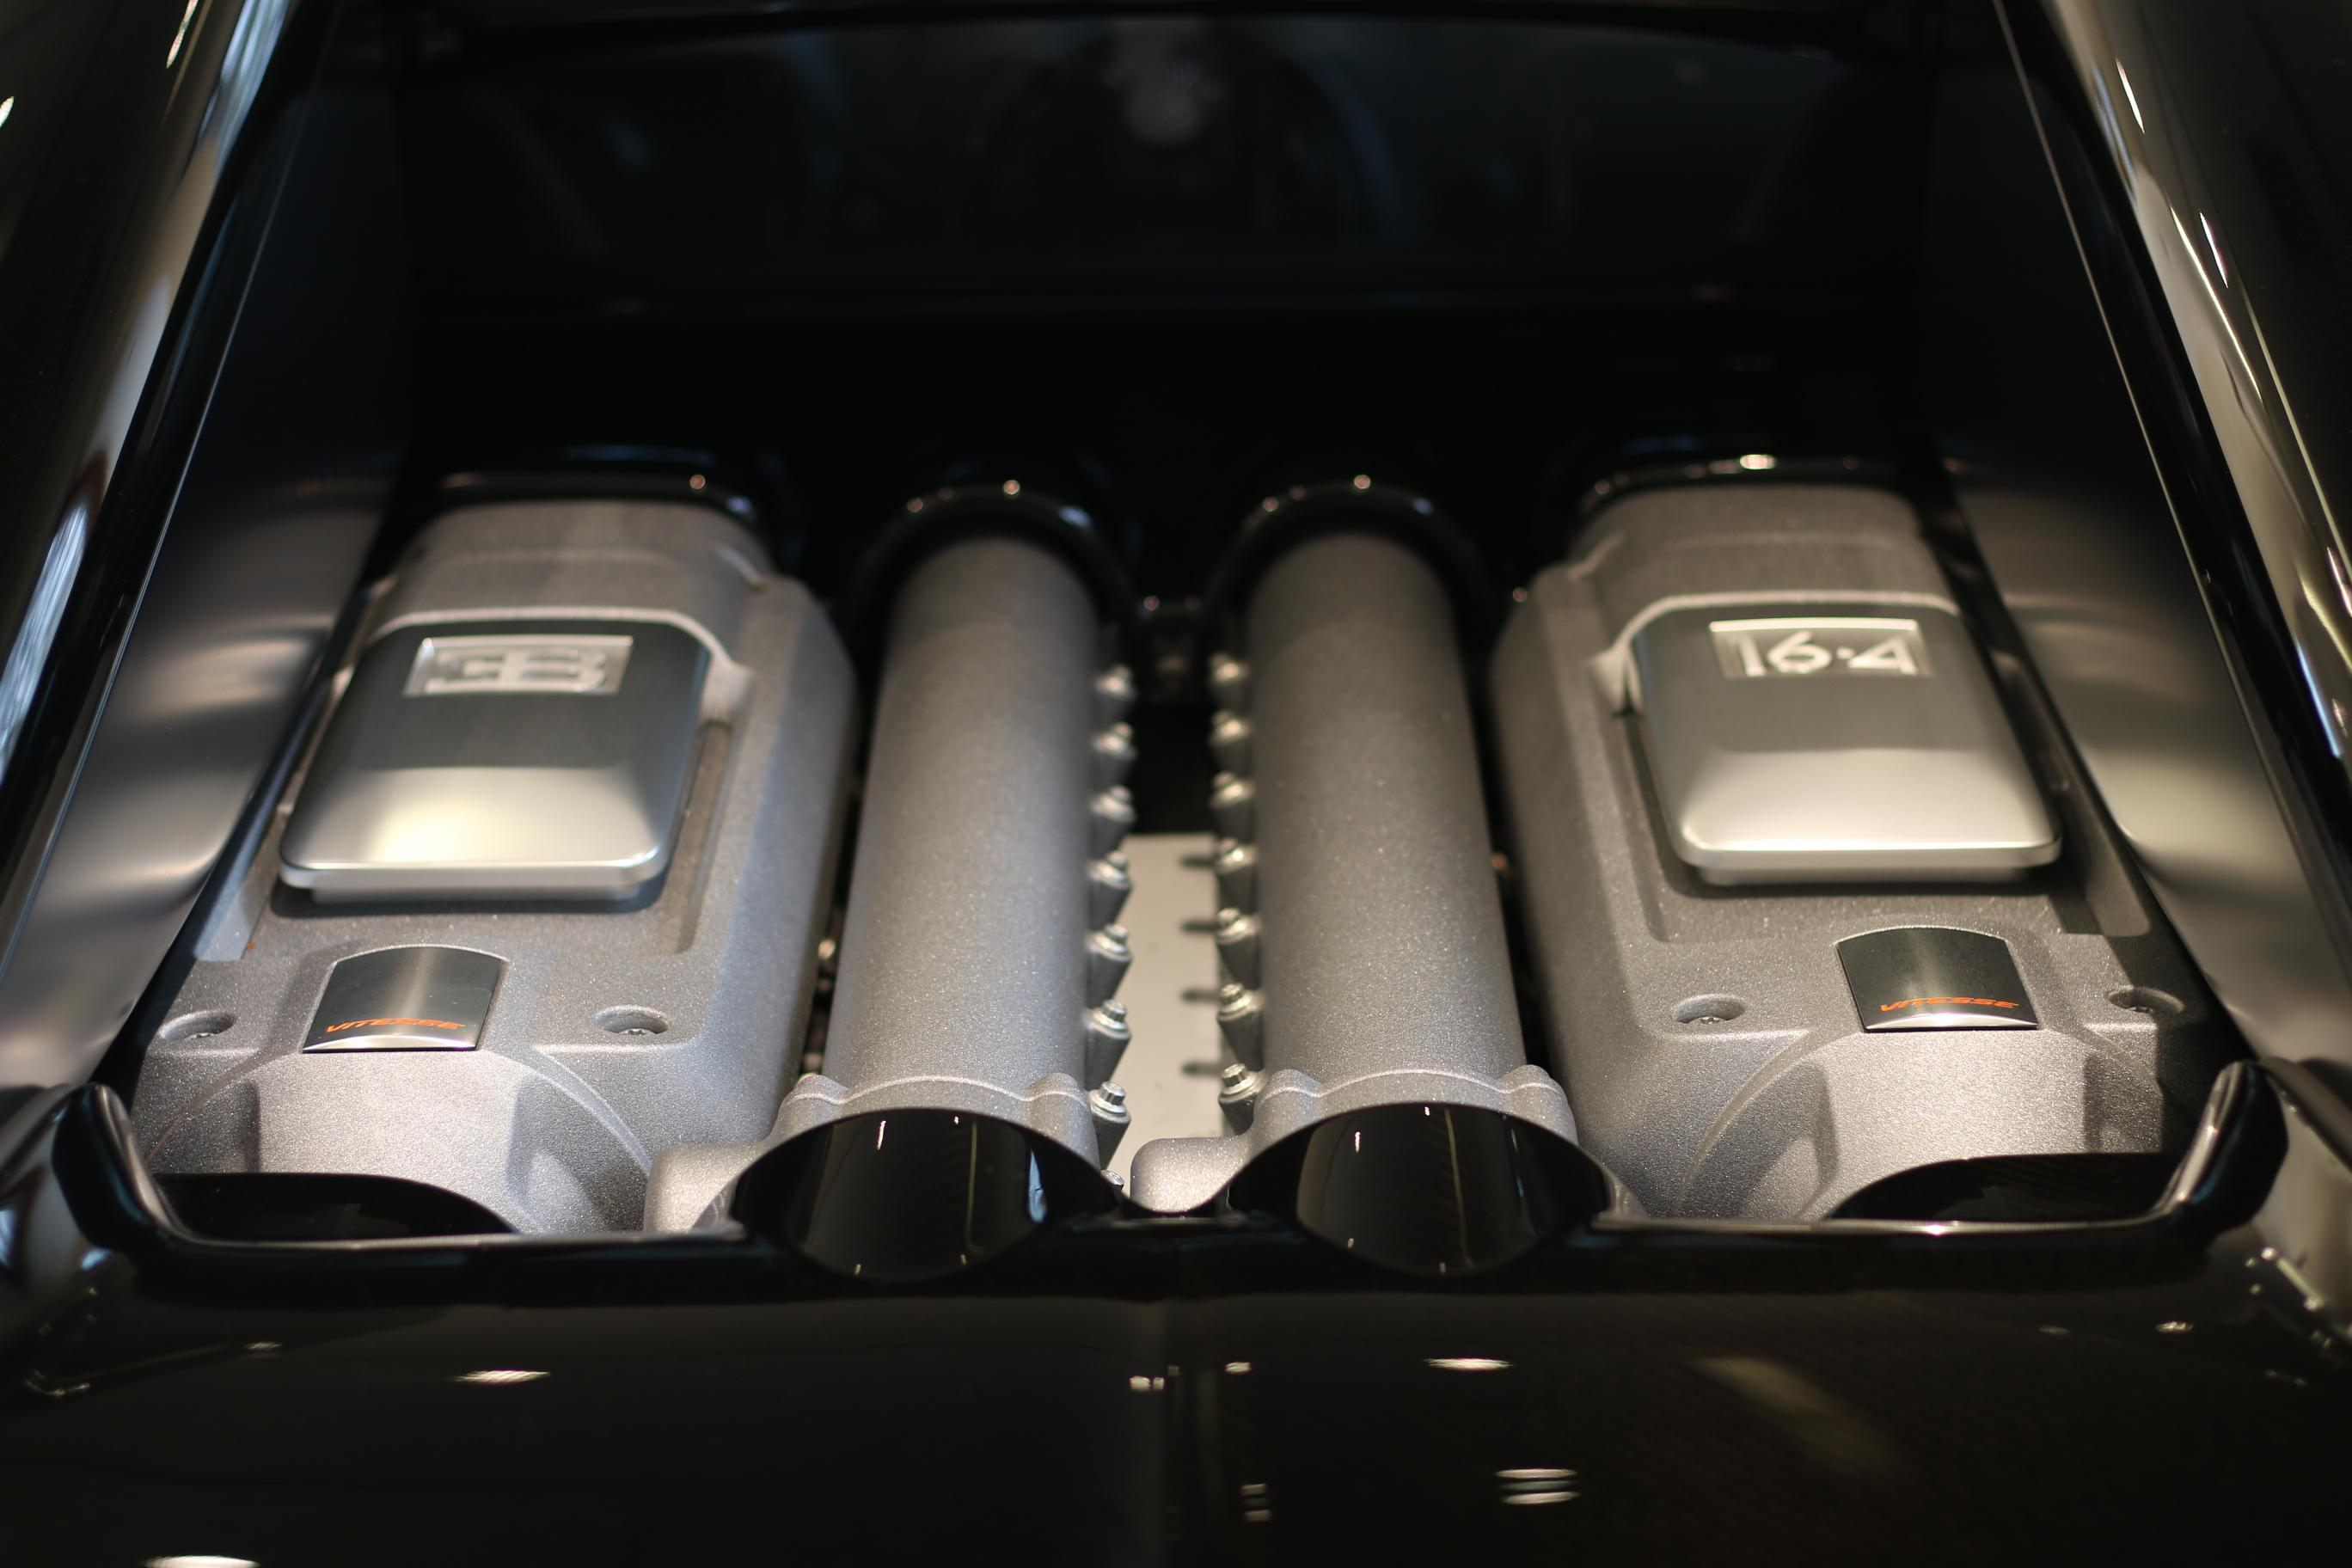 Bugatti-Veyron-Grand-Sport-Vitesse-WRC-2 Cozy Bugatti Veyron W16 Engine Price Cars Trend